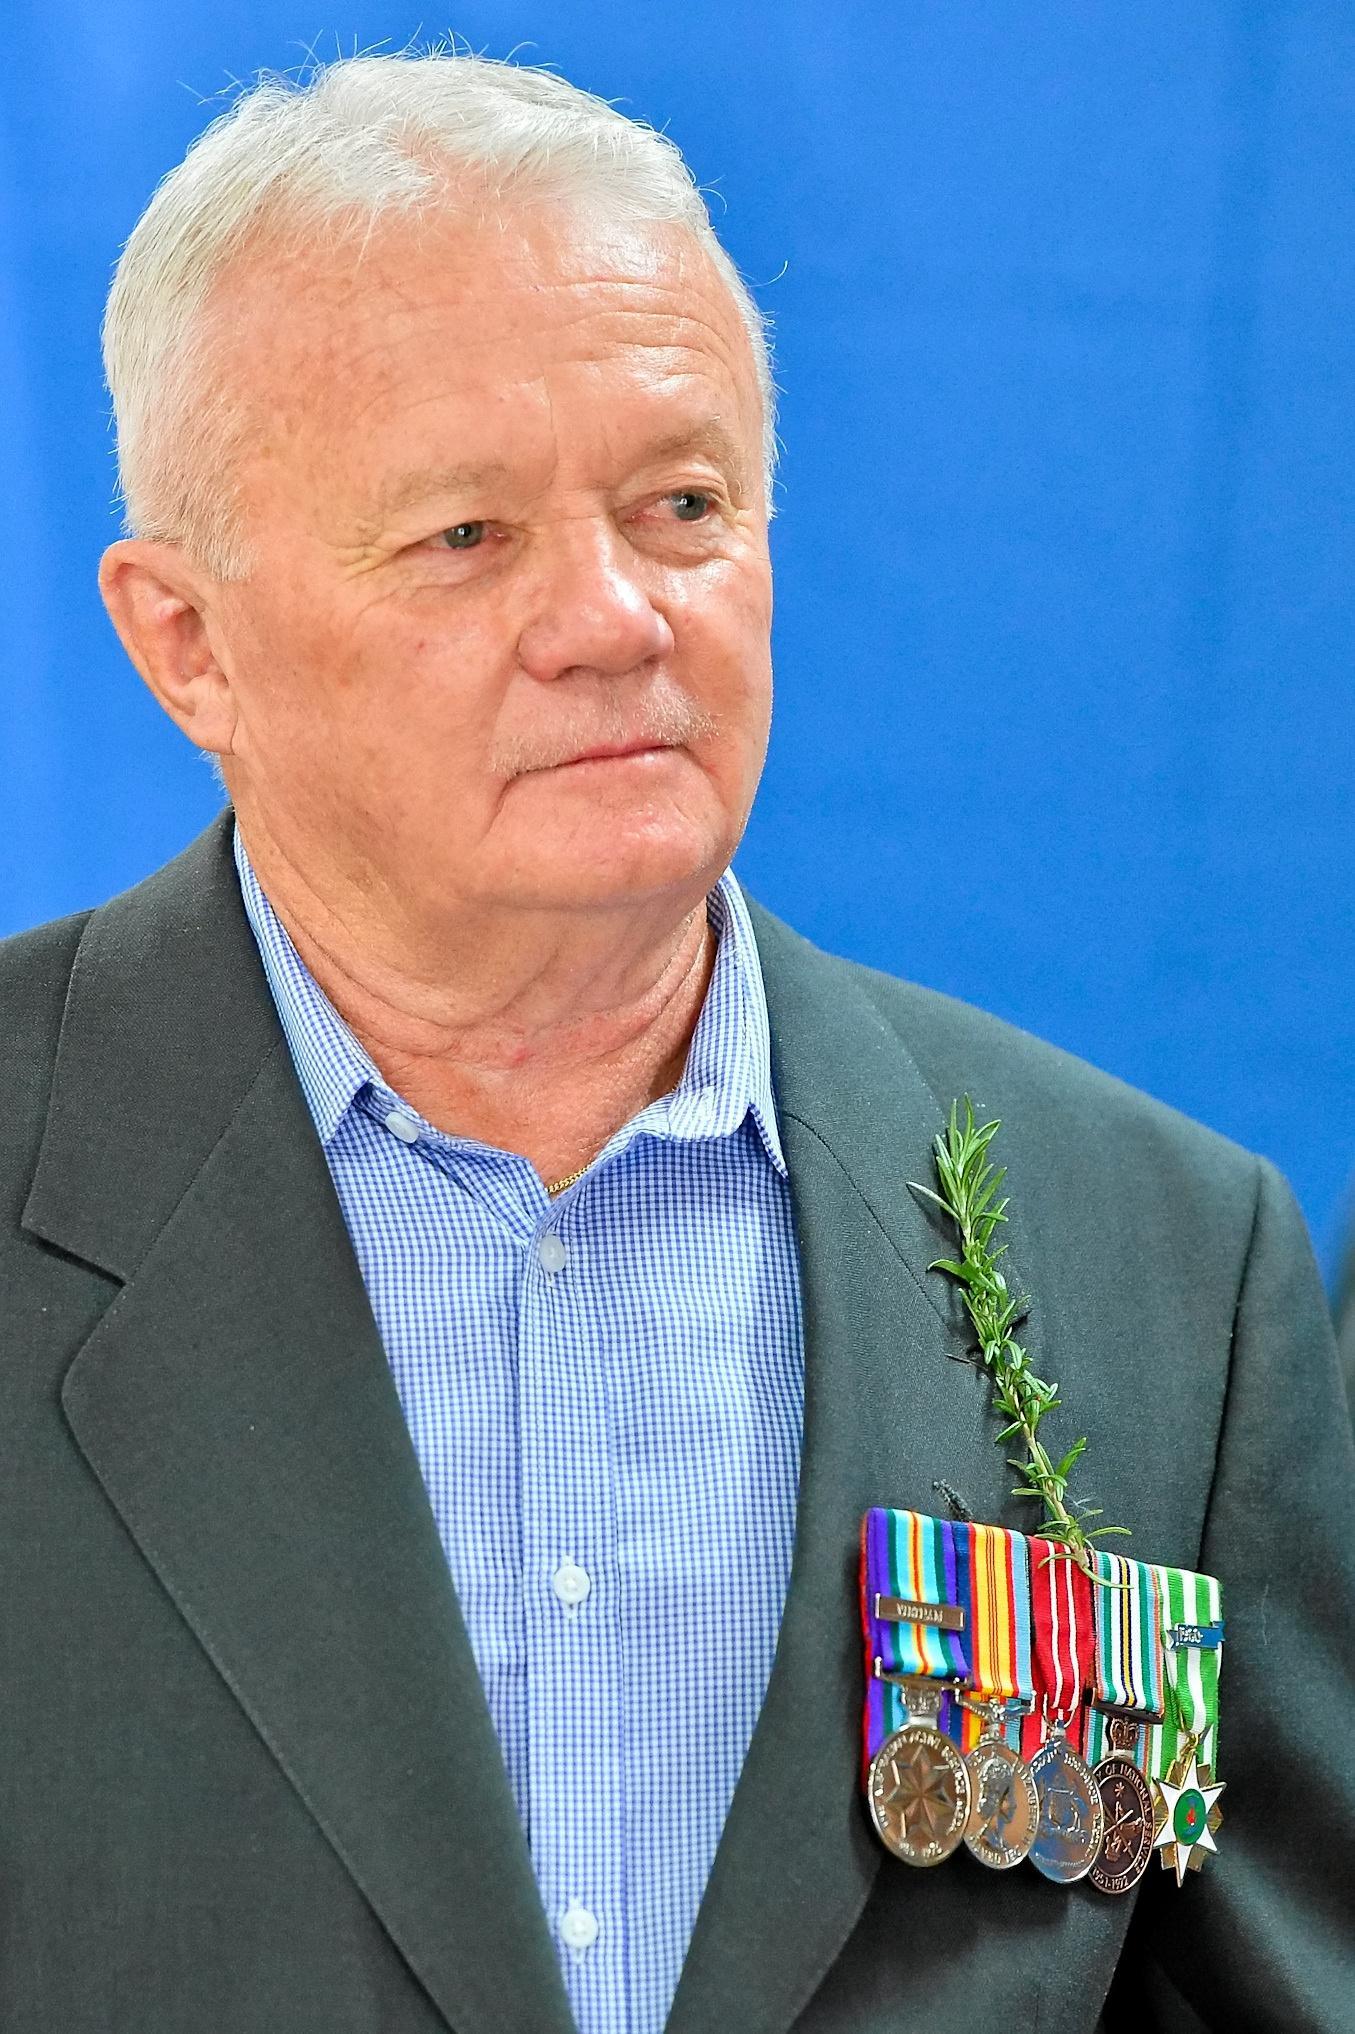 Vietnam veteran Rob Long at the Anzac dawn service in Gladstone, 2017.